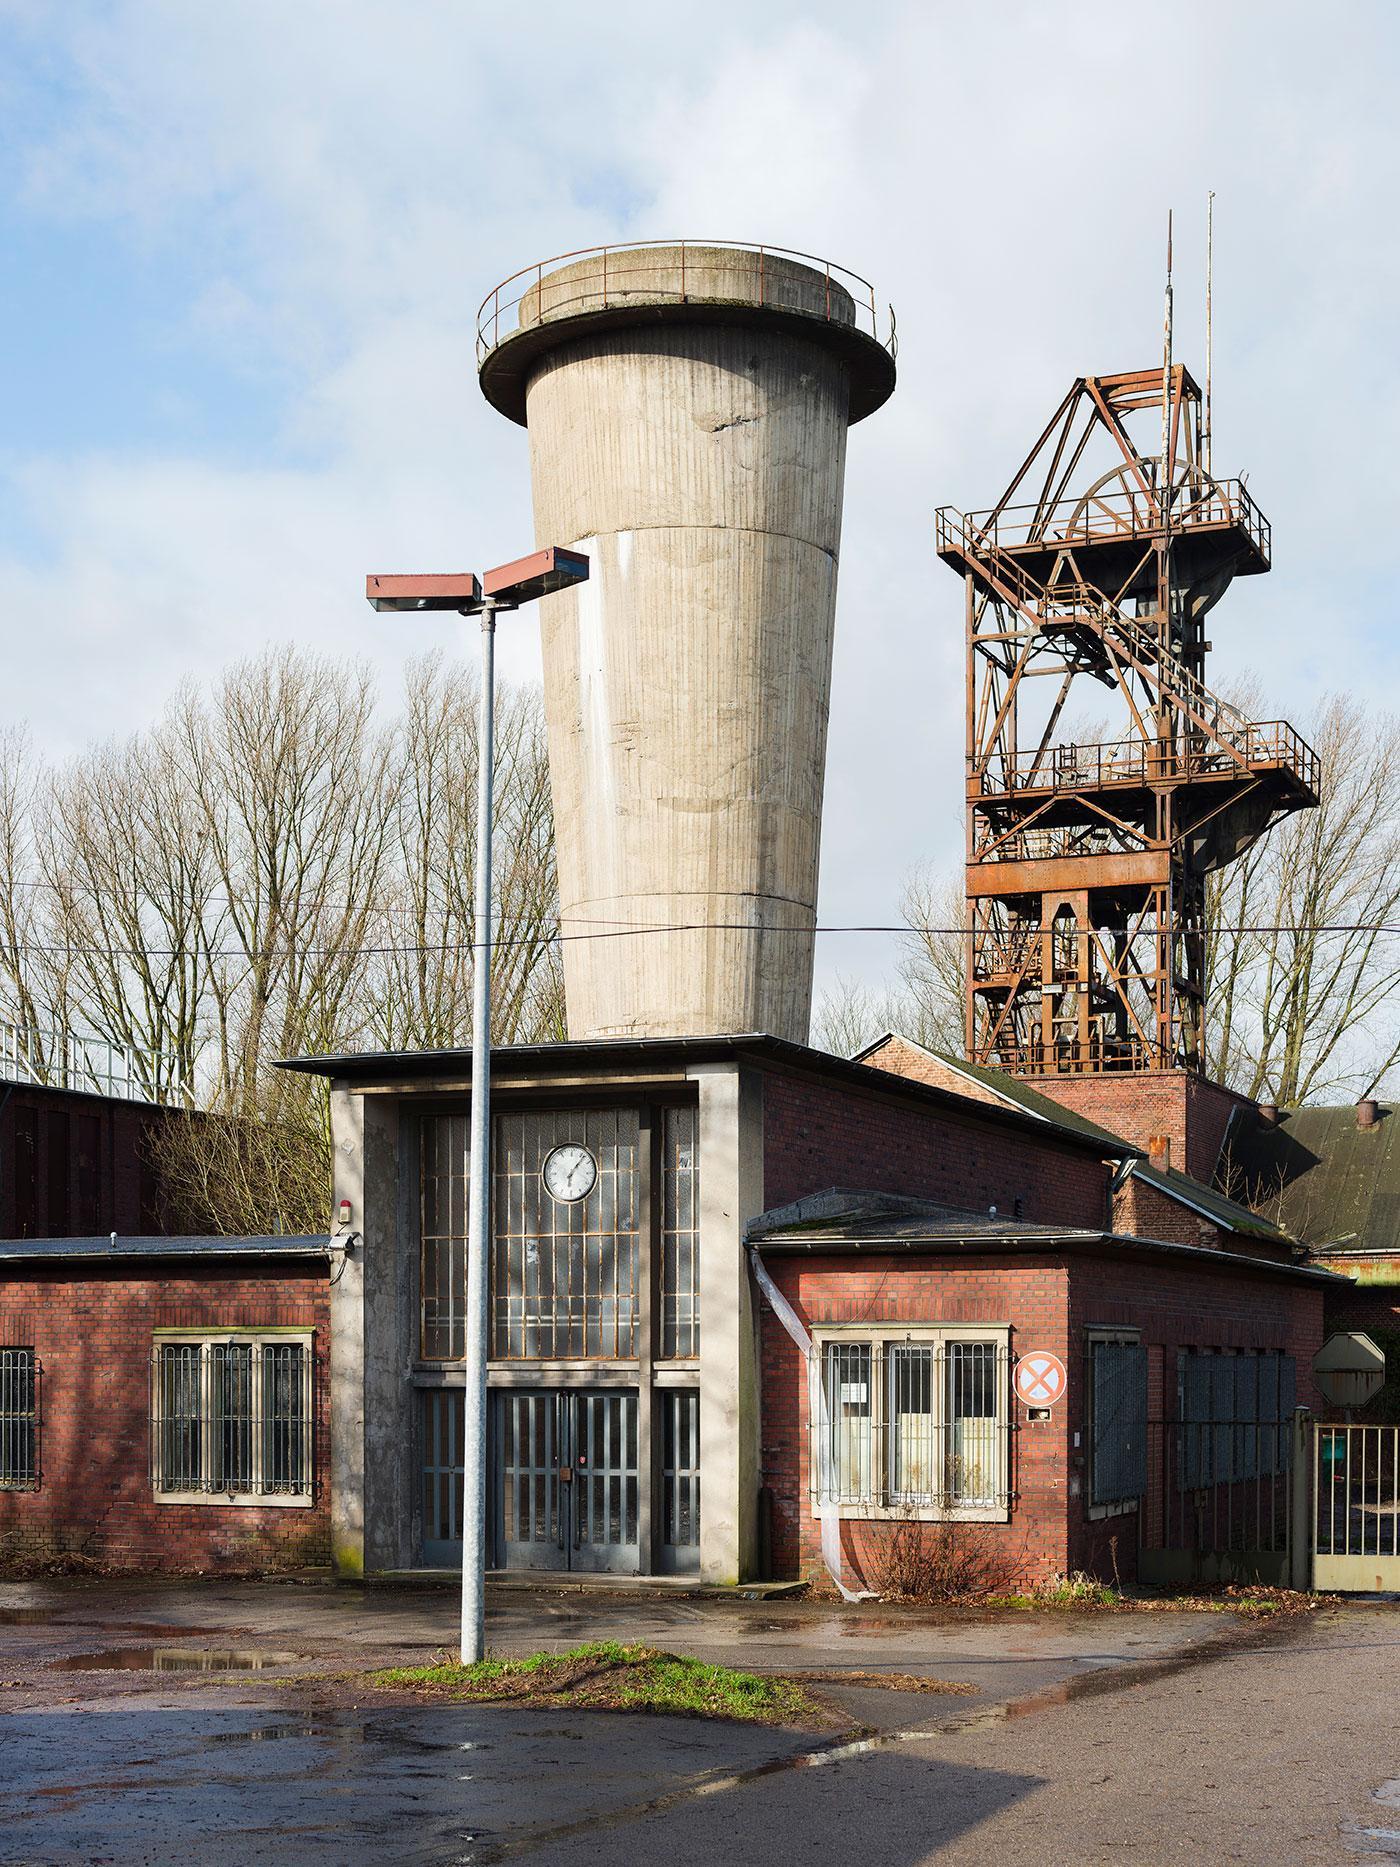 Ruhr-Ding-Klima_Standort-Zeche-General-Blumenthal-in-Recklinghausen-I-©-Henrich-Holtgreve,-Urbane-Künste-Ruhr.jpg